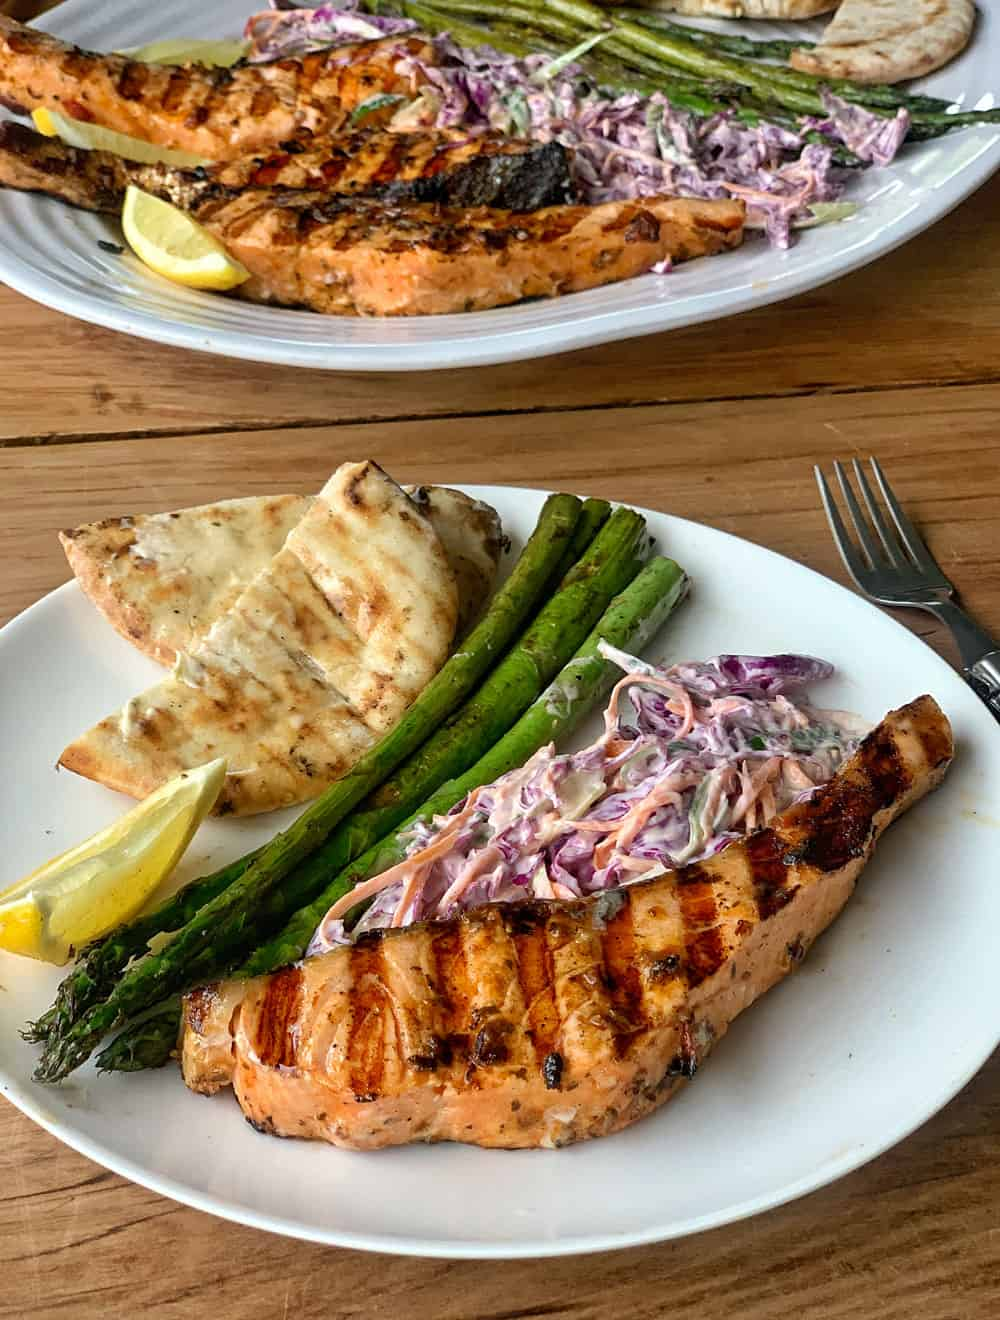 BBQ Pesto salmon with Slaw